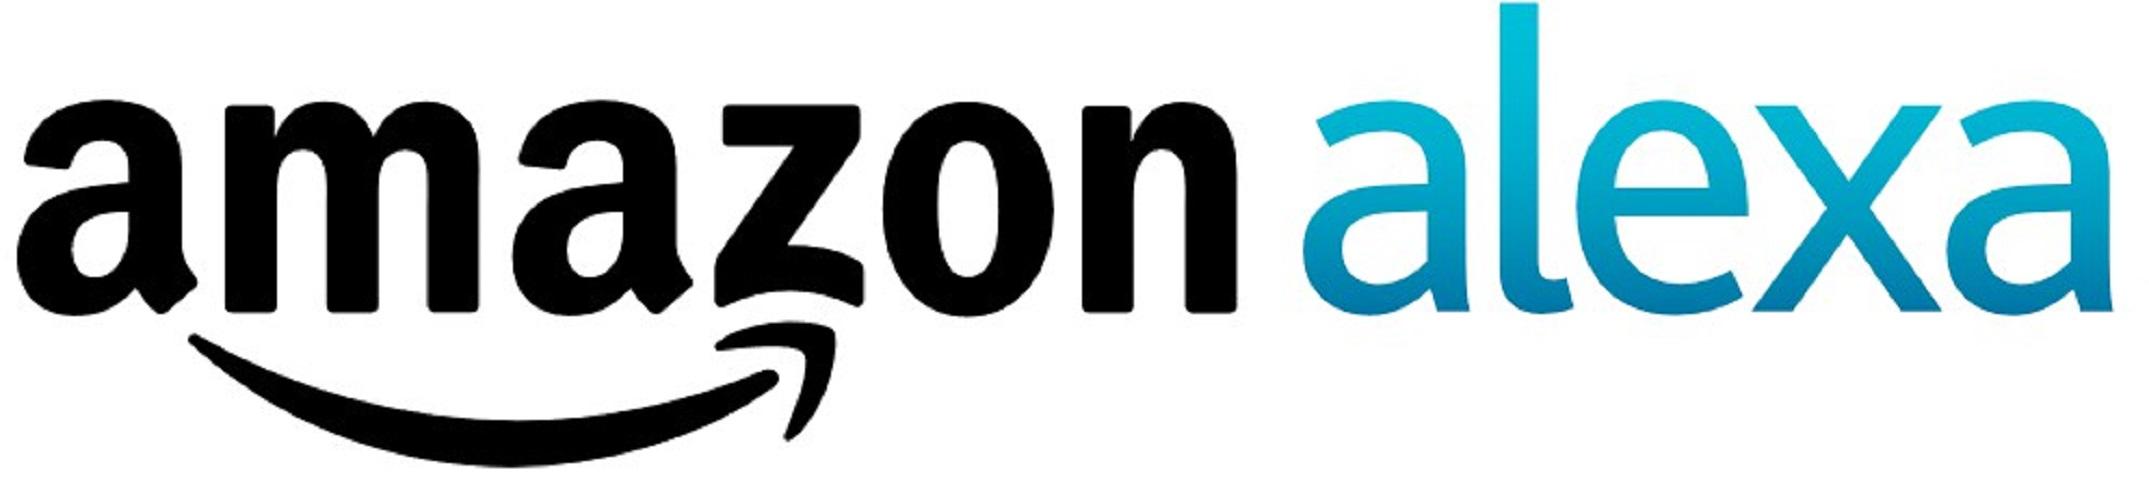 Amazon Alexa Microsoft Cortana accordo